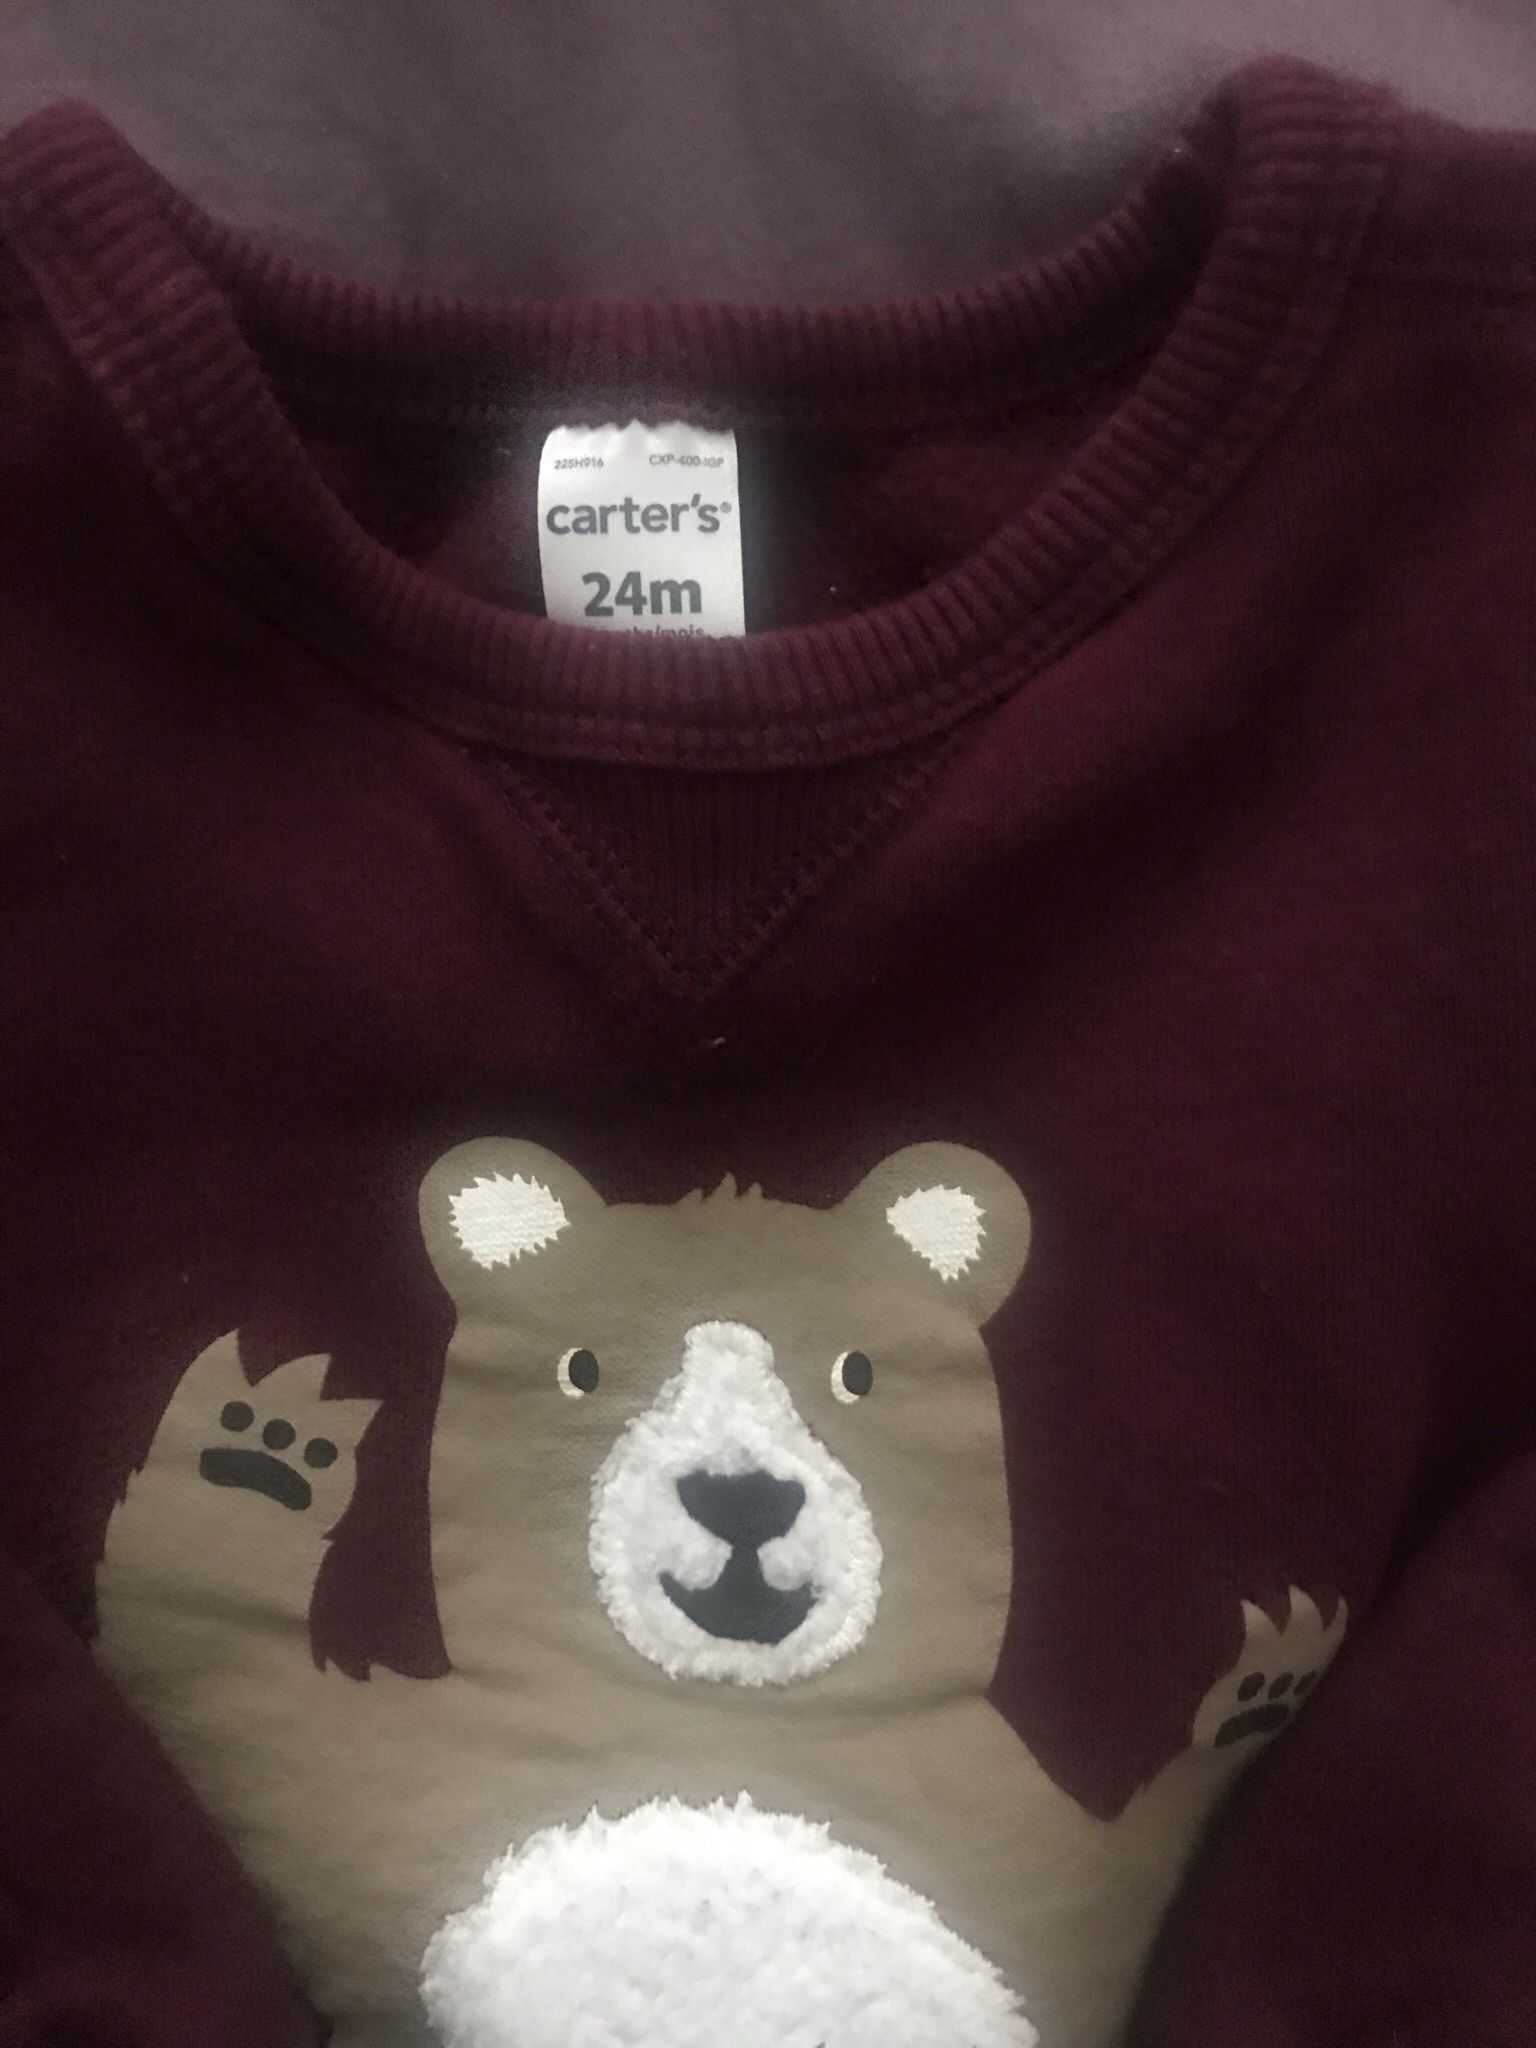 Carter's Burgundy Bear Sweatshirt 24M